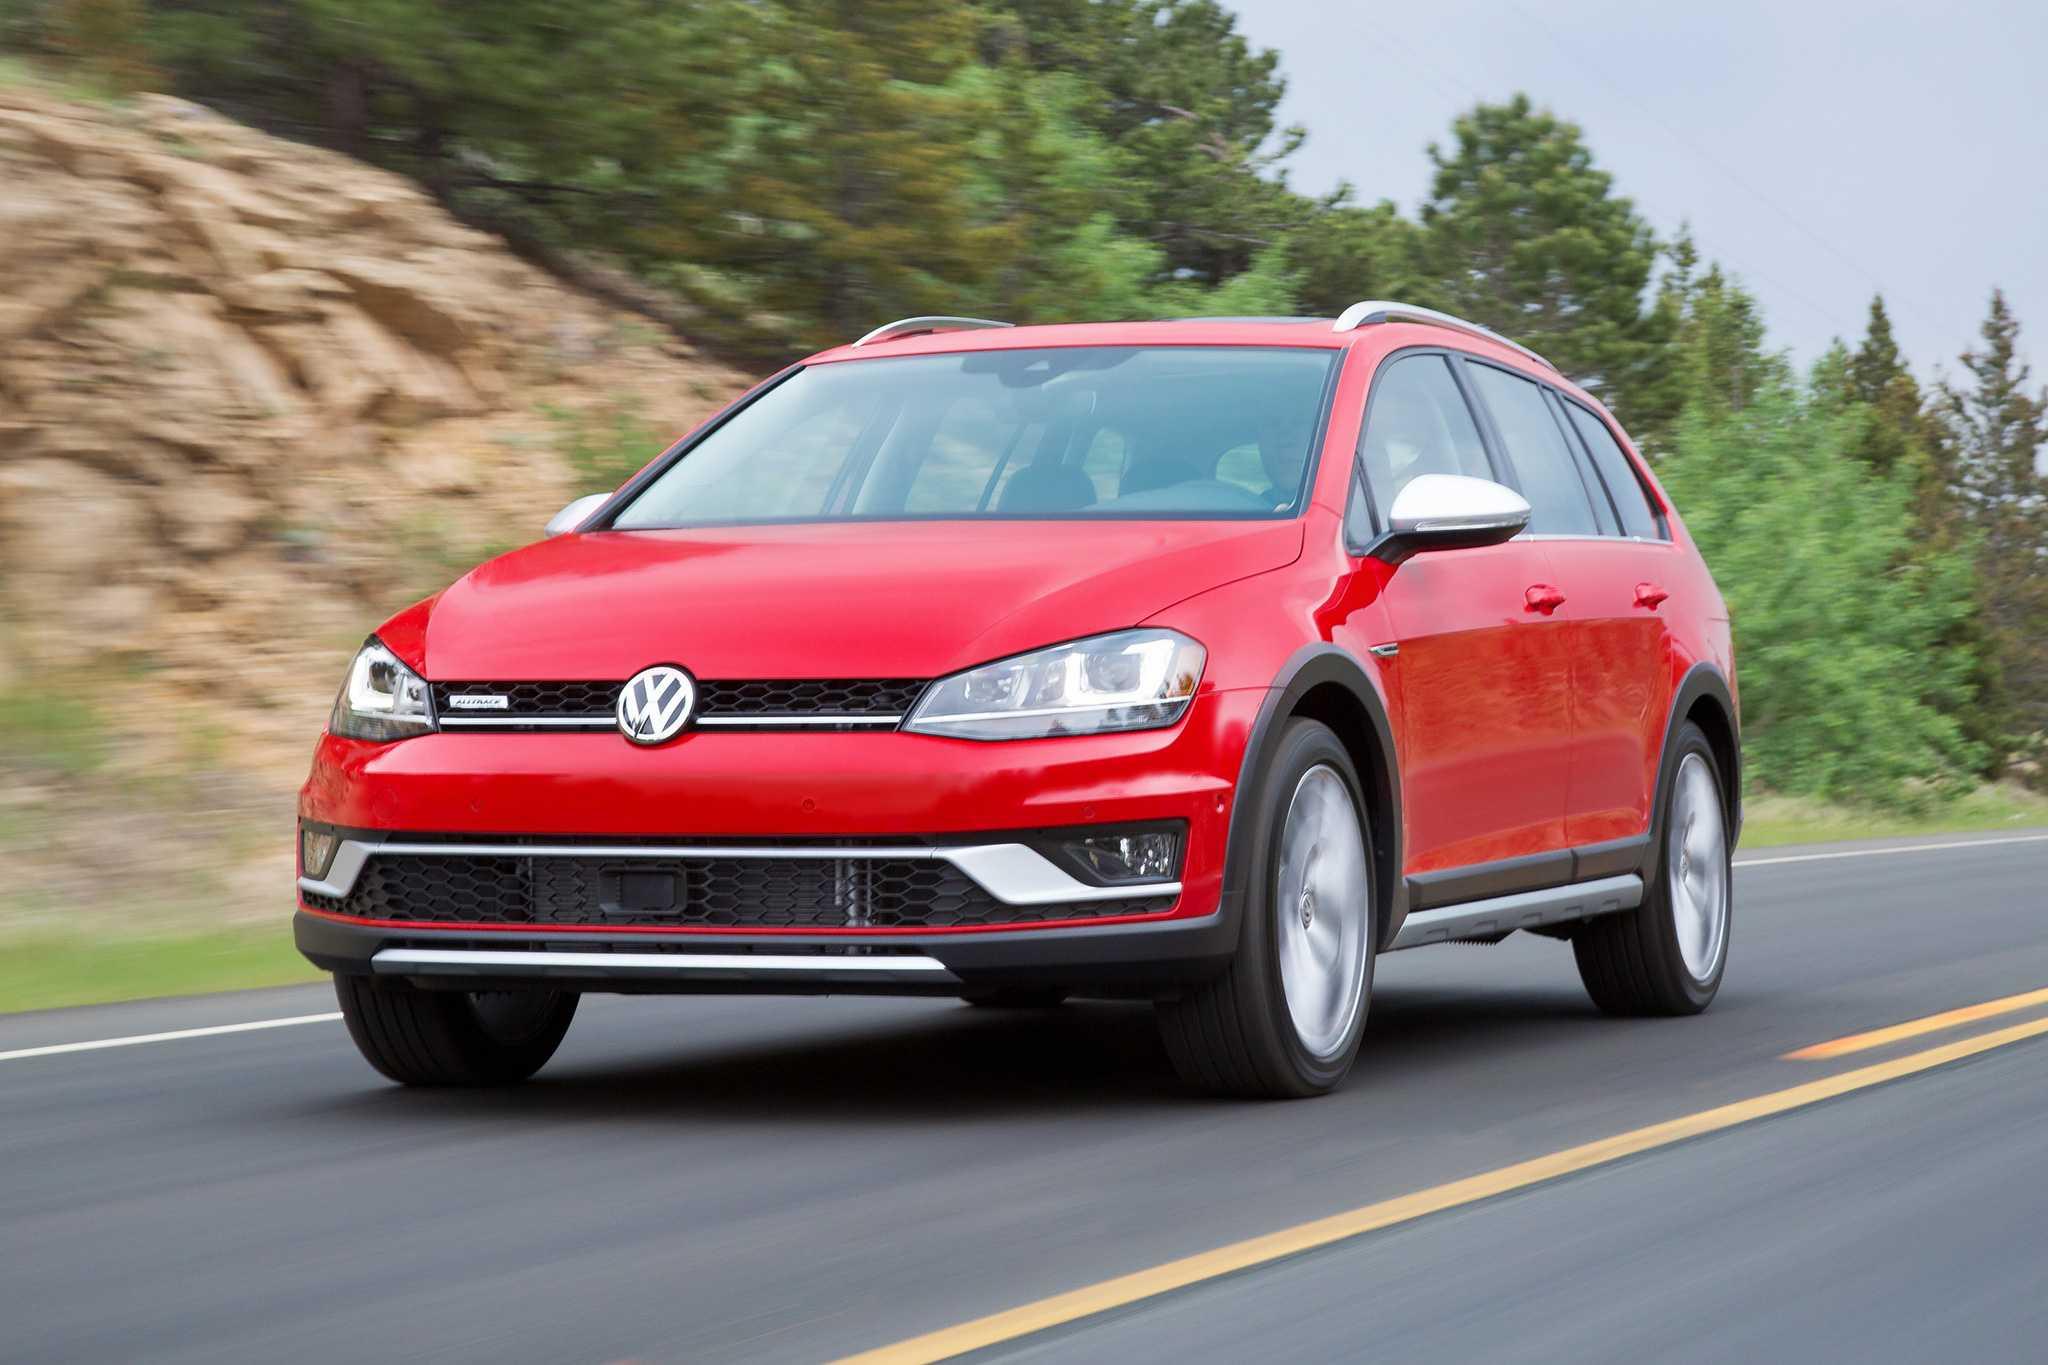 2017 Volkswagen Golf Alltrack Pricing Starts At $26,670